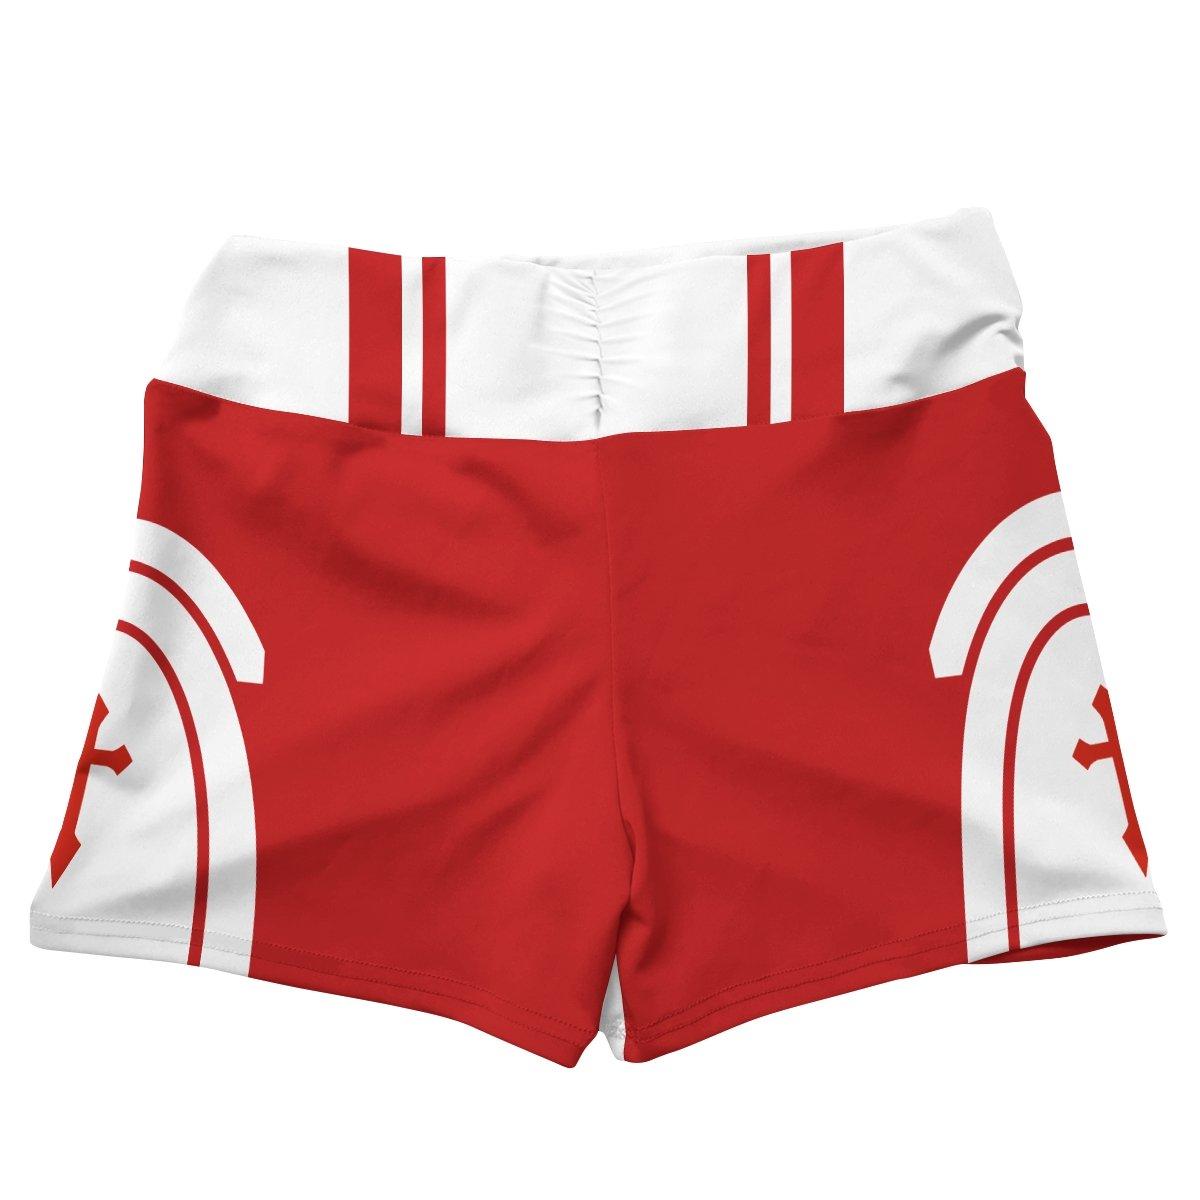 asuna summer active wear set 607701 - Anime Swimsuits